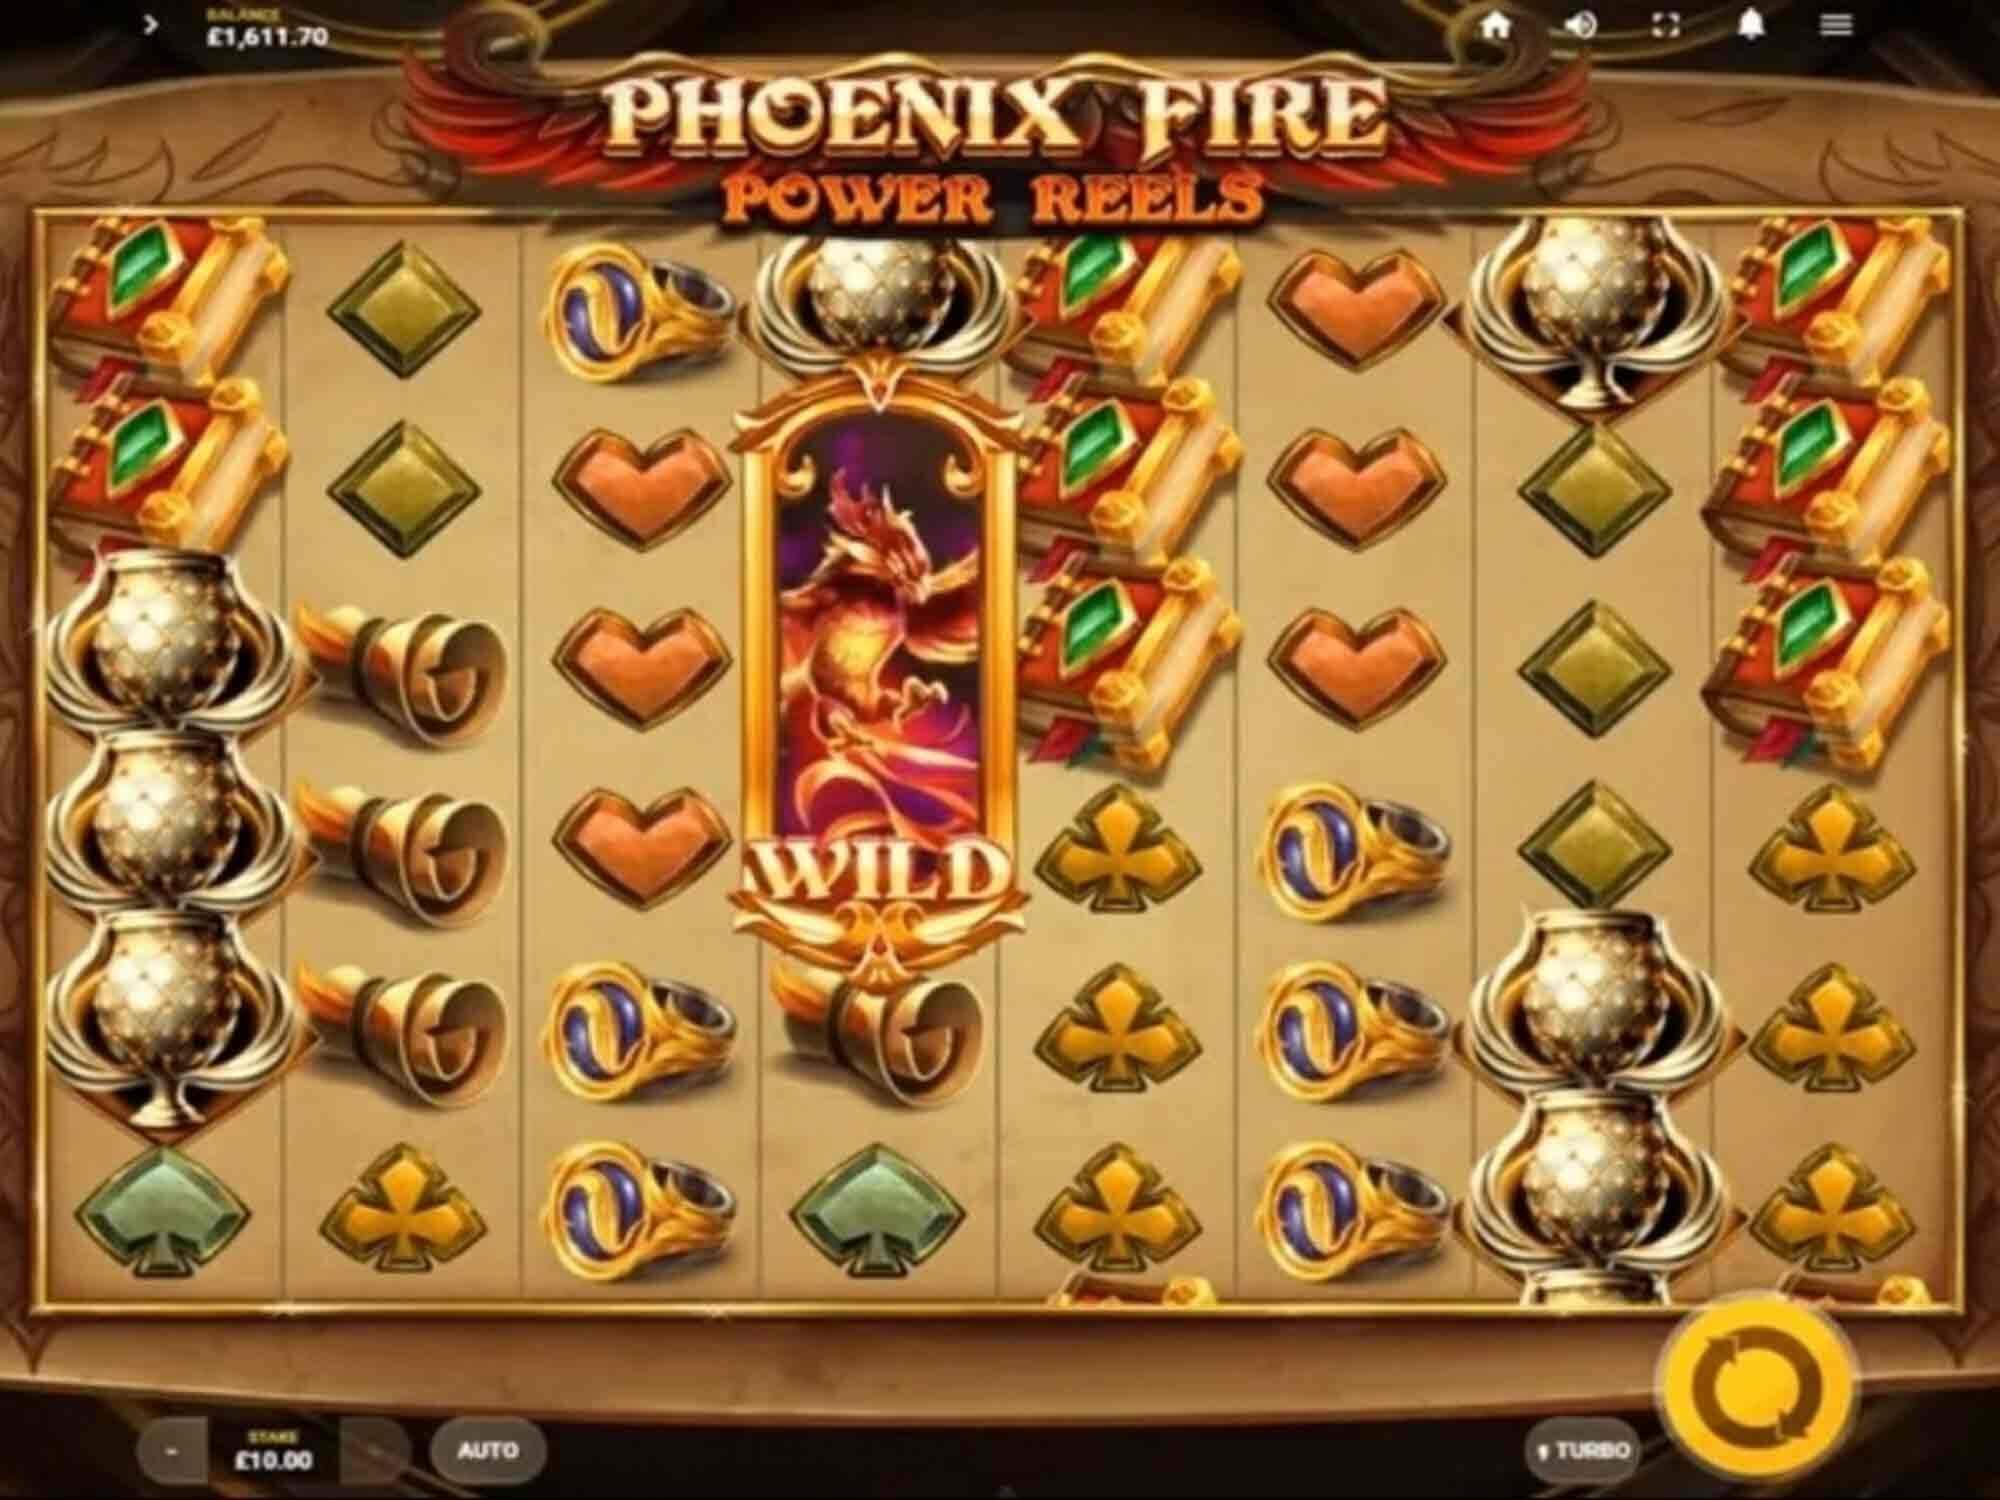 Phoenix Fire Power Reels Slot Gameplay